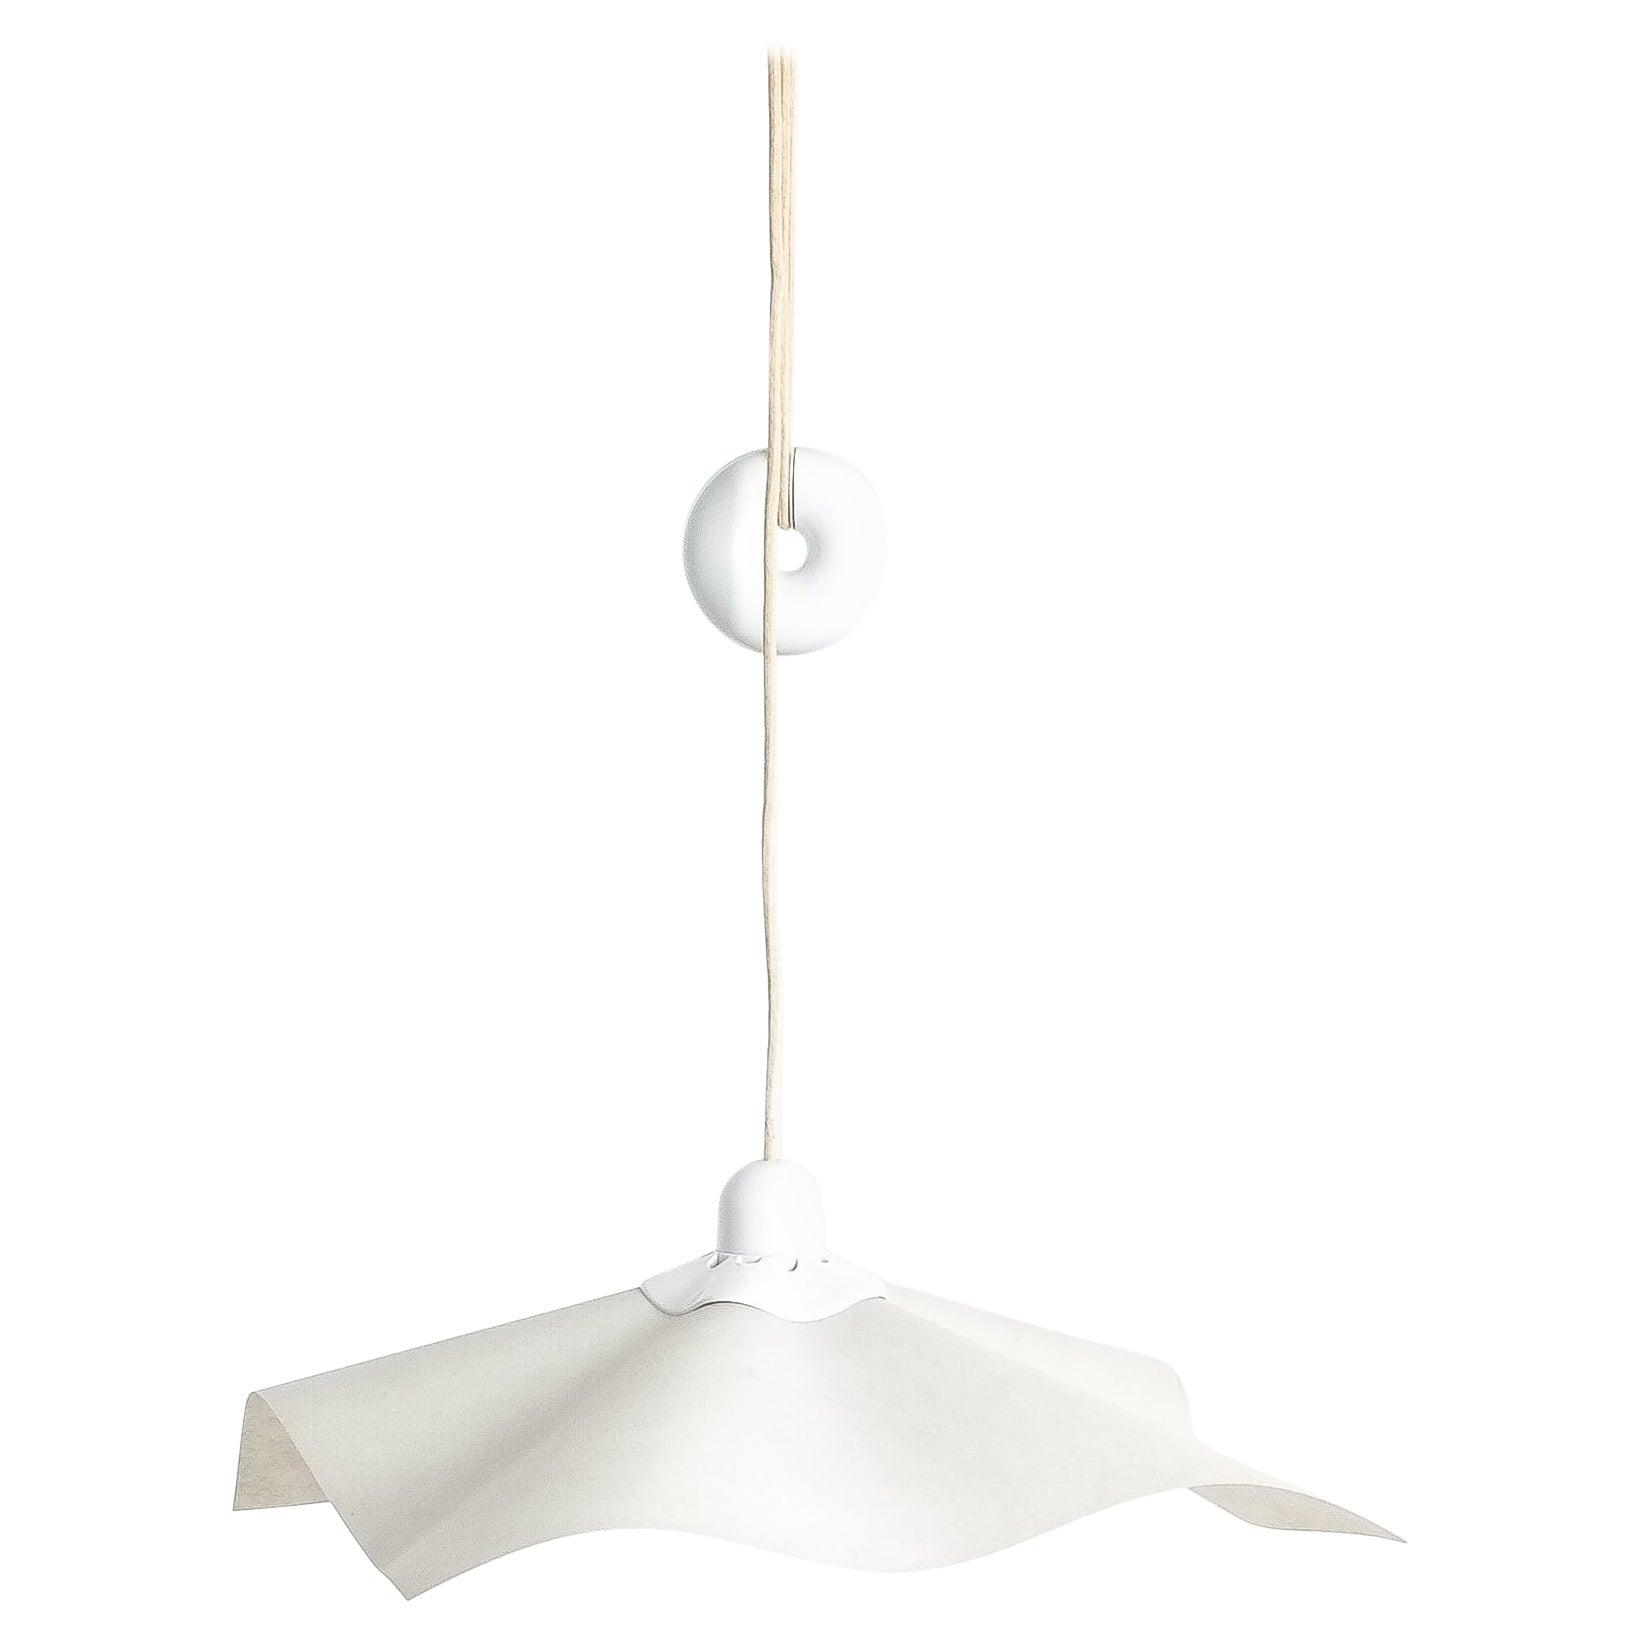 Mario Bellini Counterweight Pendant Lamp Area 50 by Artemide, Italy, 1976